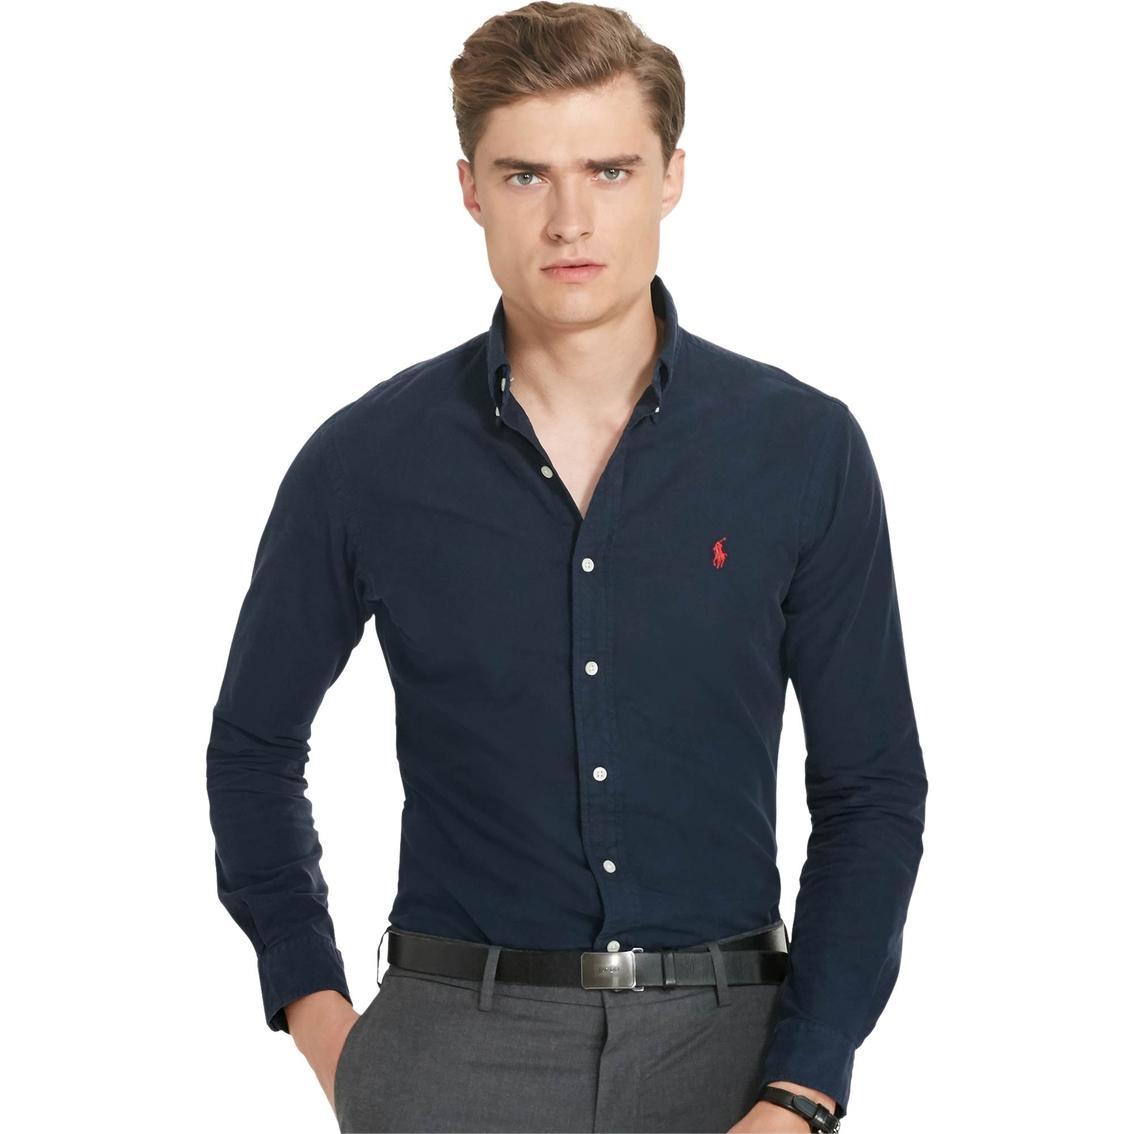 2267ae017 Polo Ralph Lauren Garment Dyed Oxford Shirt | Polo Ralph Lauren ...